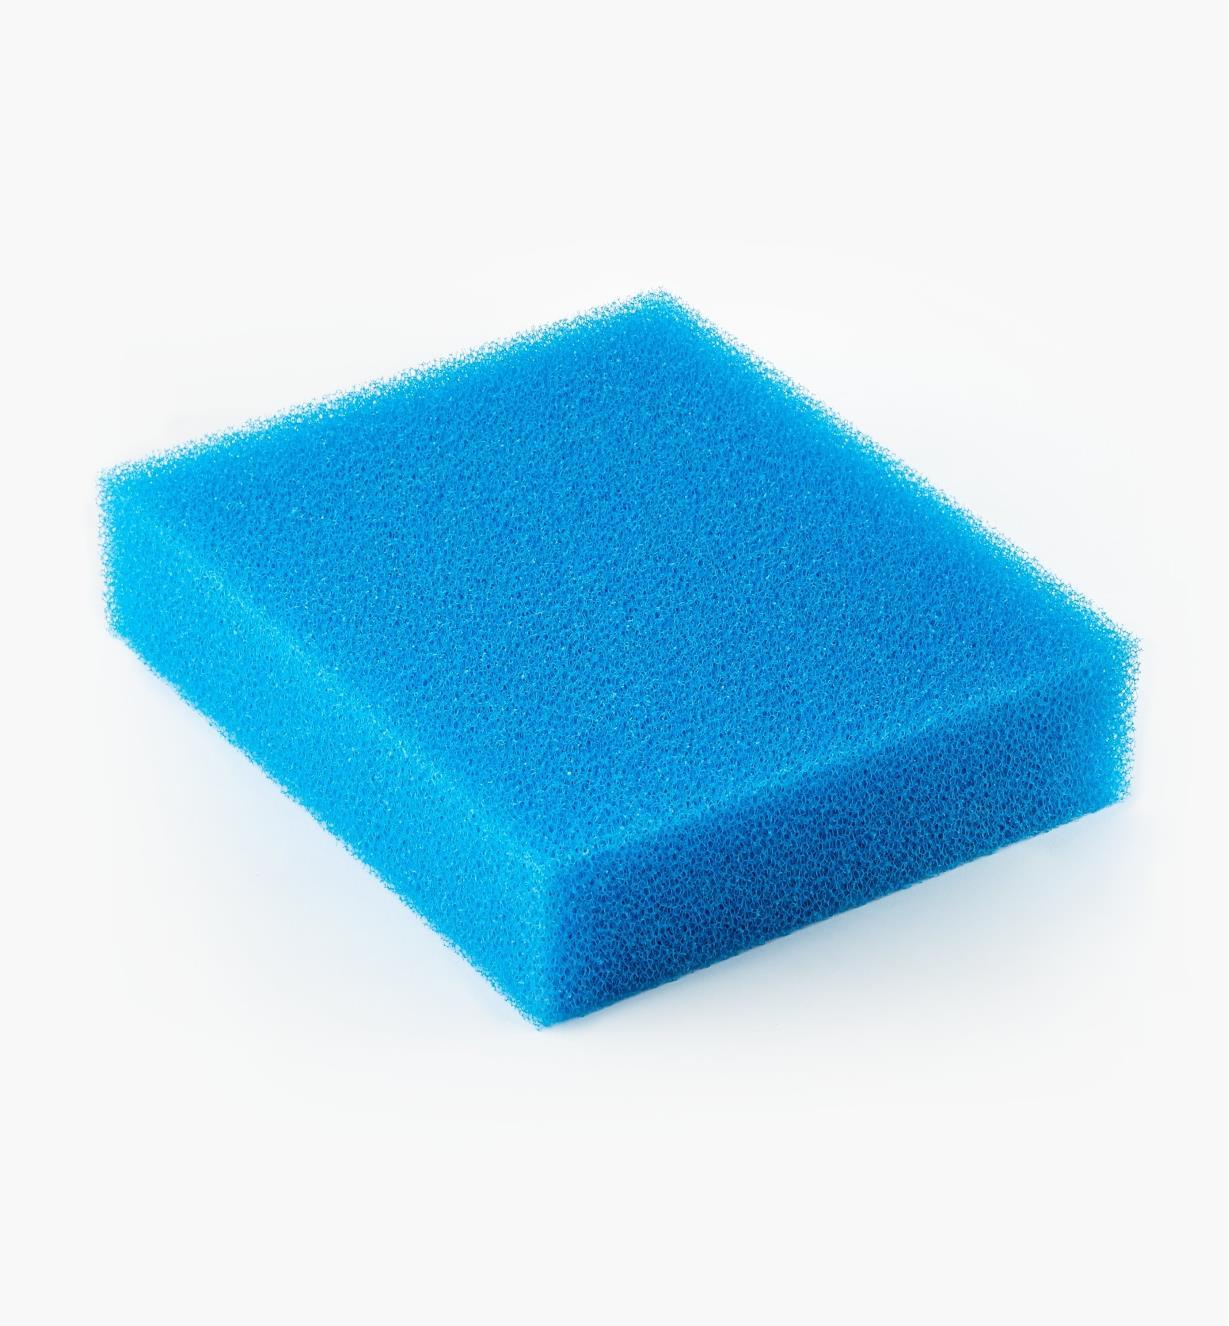 ZA496169 - Wet Filter Element (CT 26 E, 36 E, 48 E)